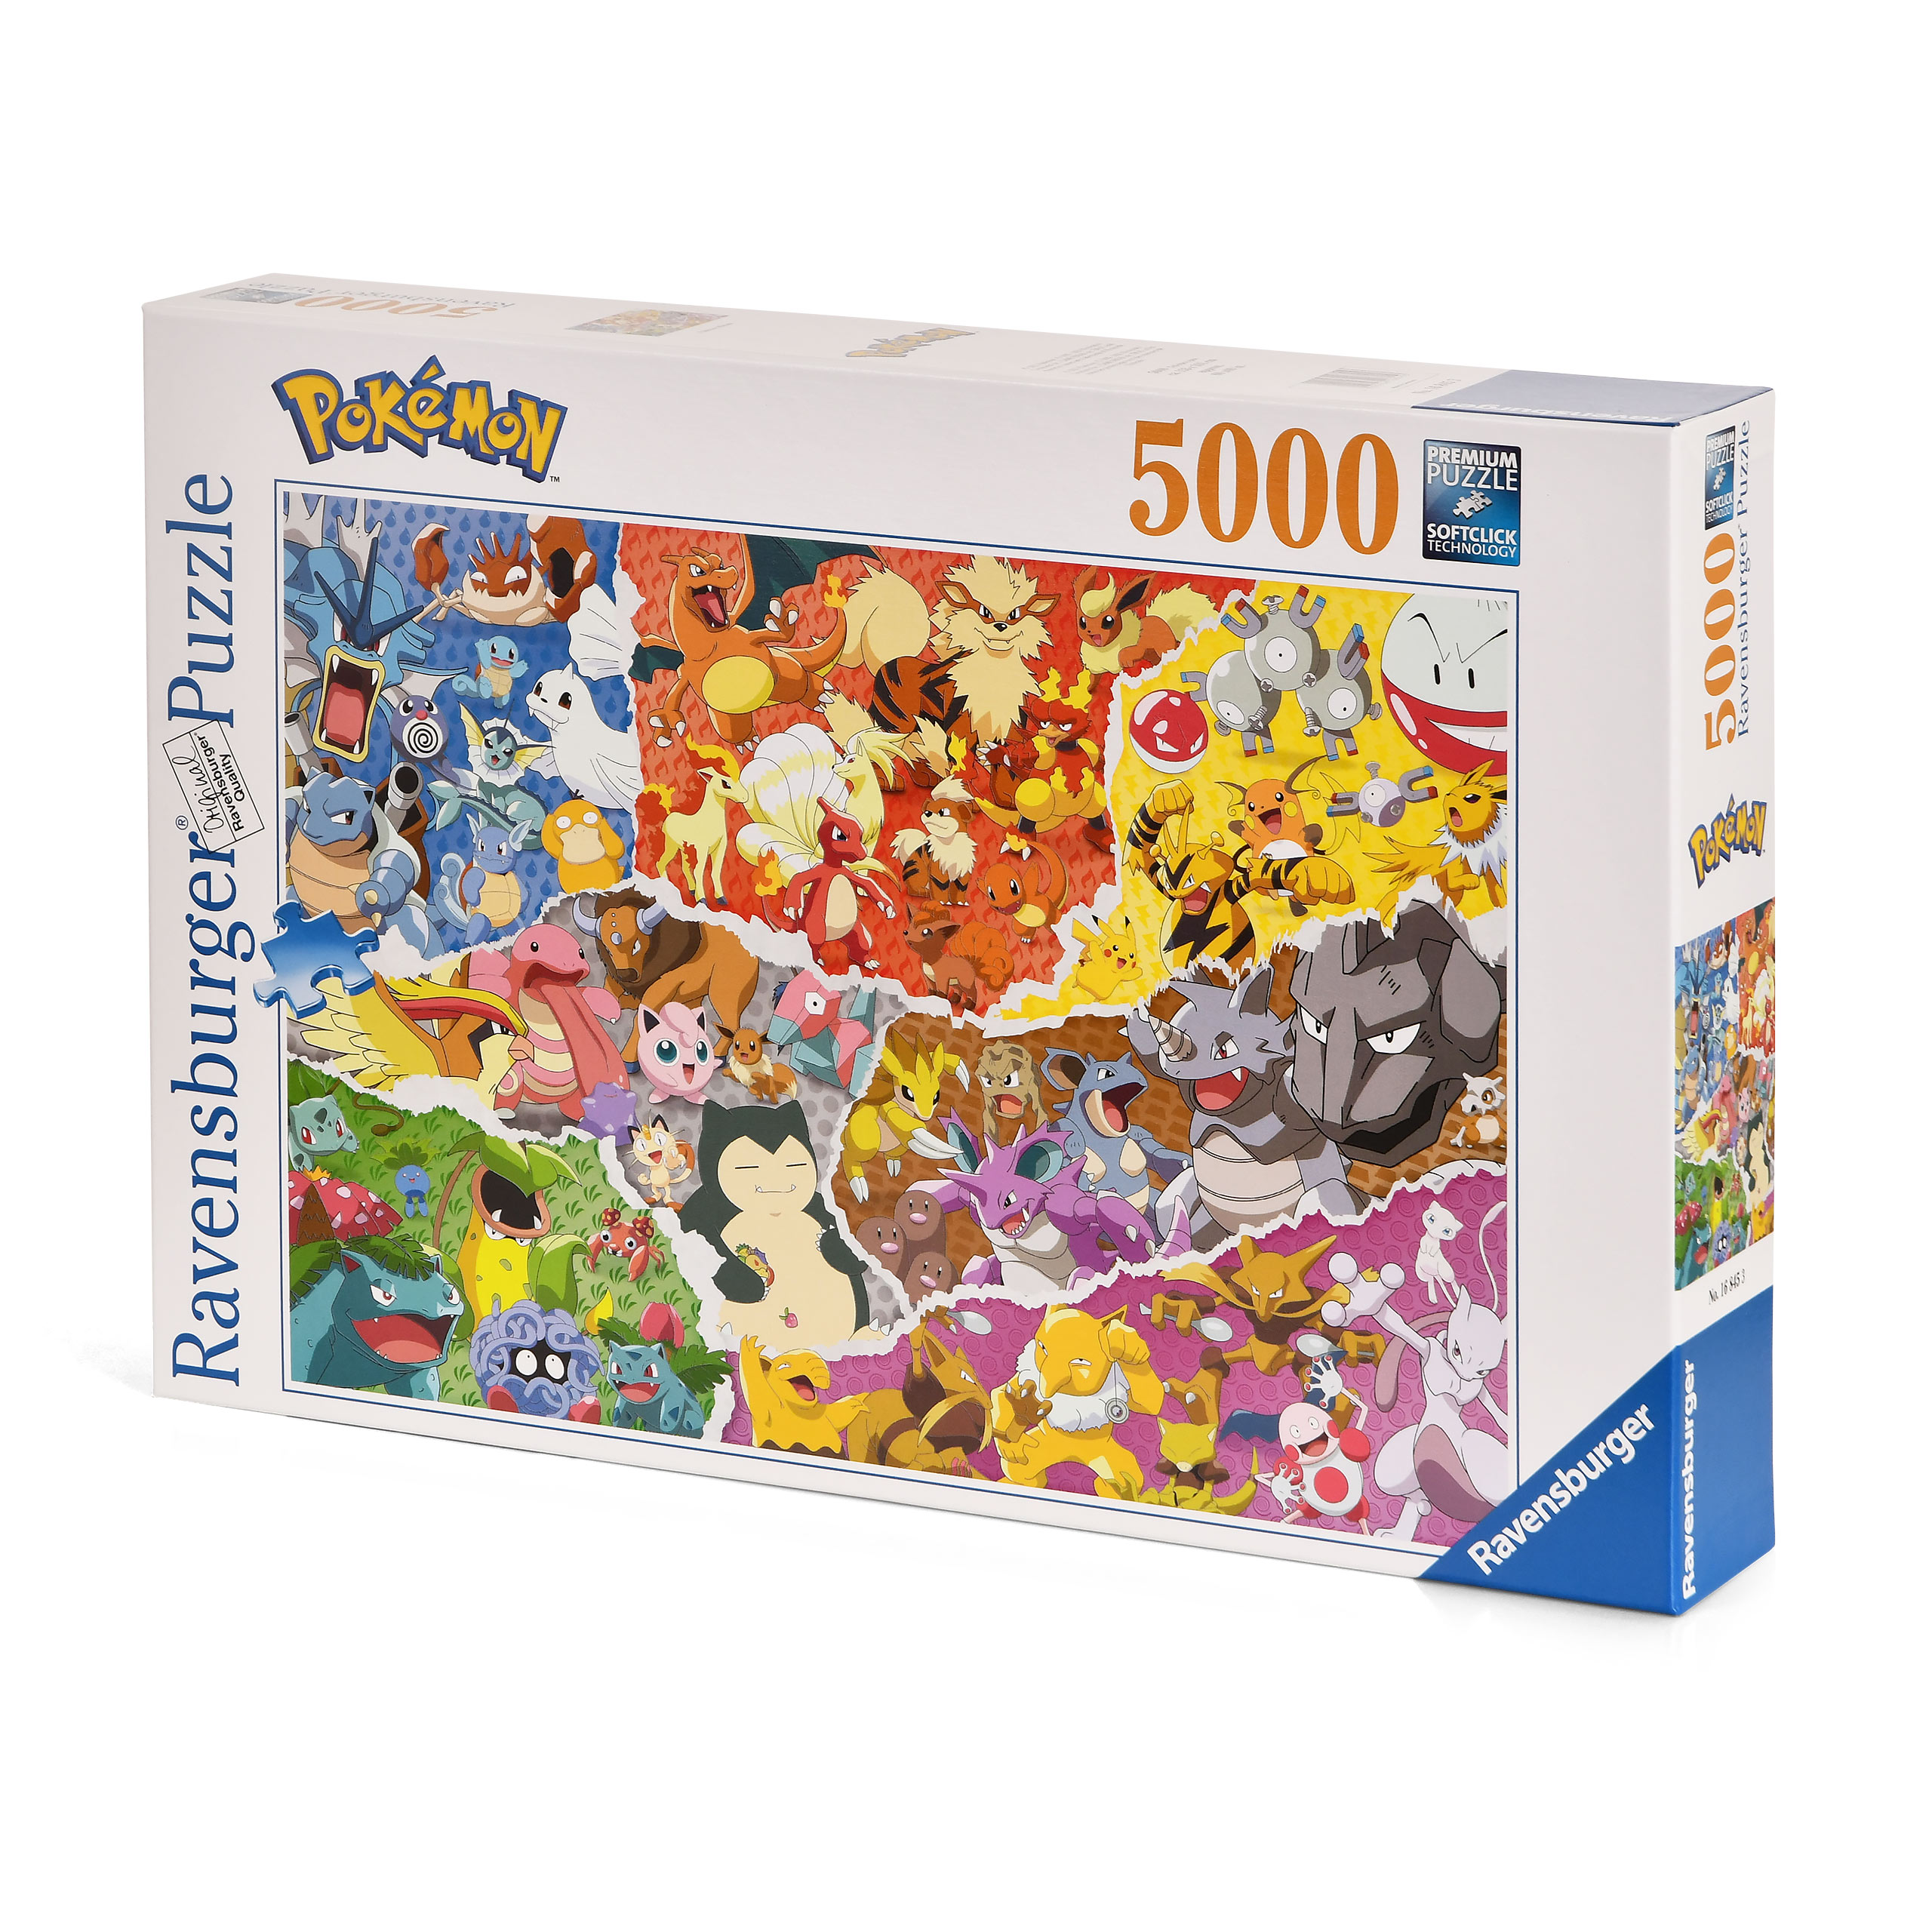 Pokemon - Allstars Puzzle 5000 Teile